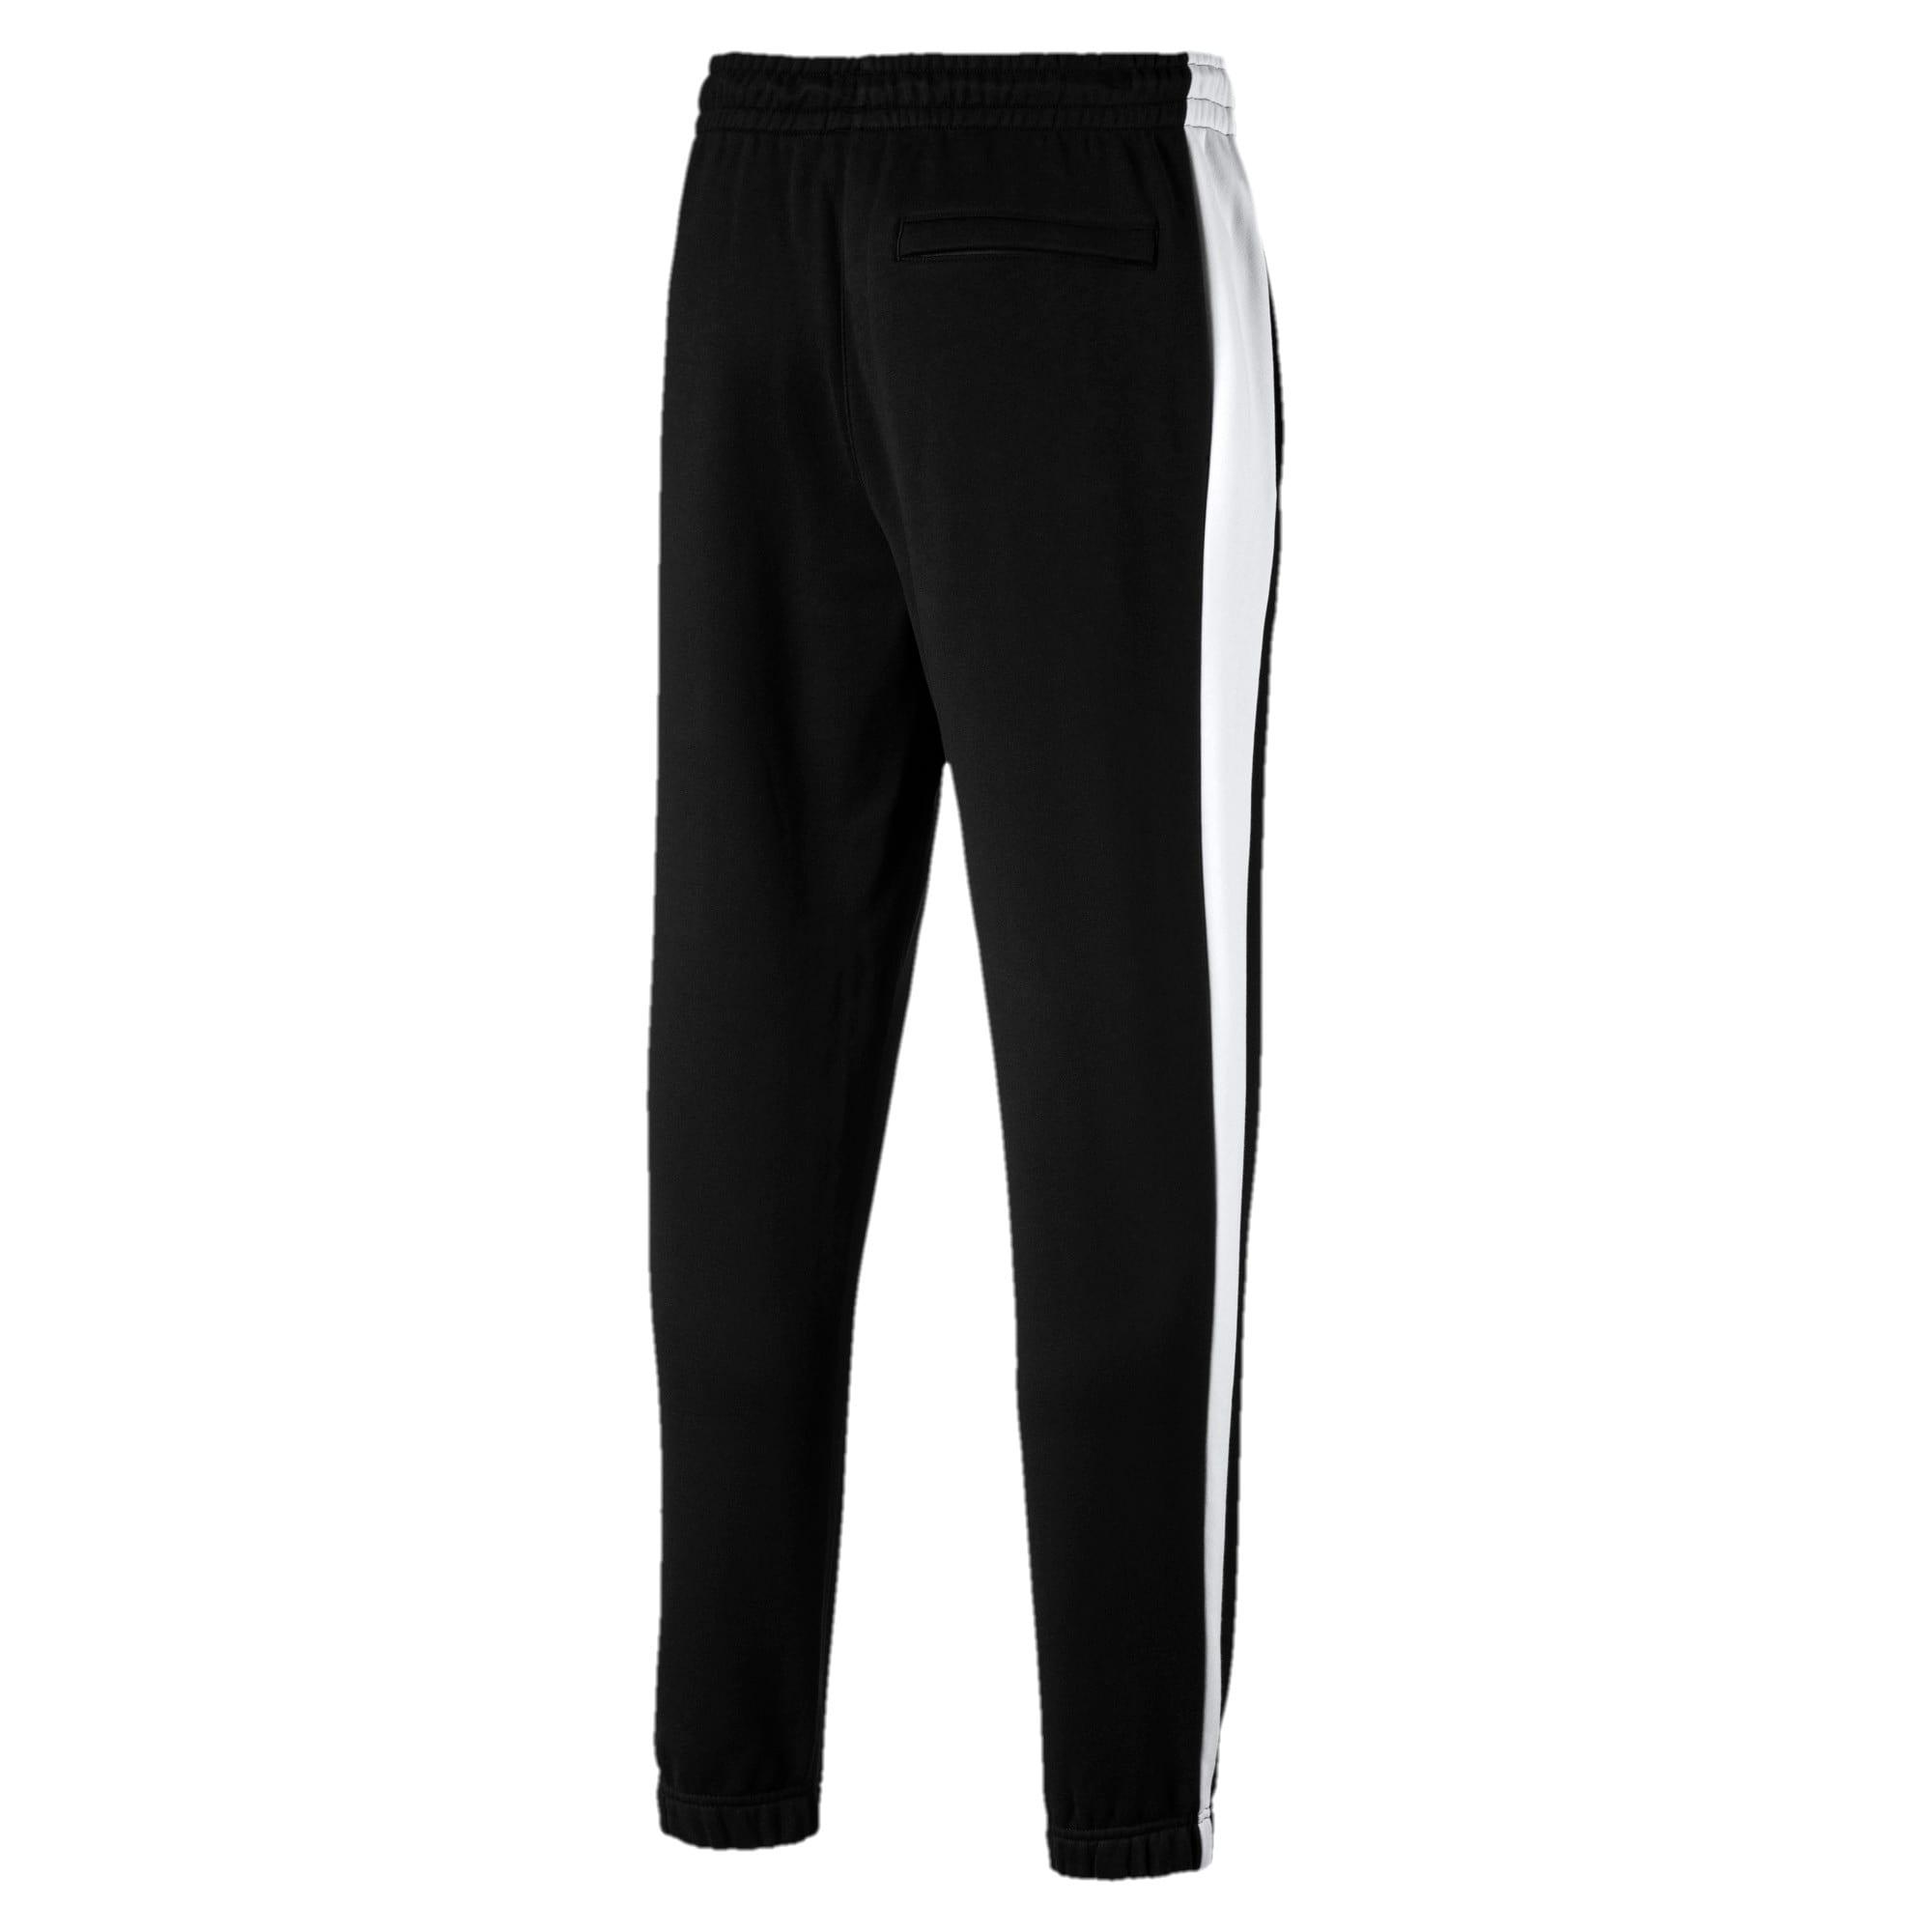 Thumbnail 2 of Classics New Pants Cuff FL, Puma Black, medium